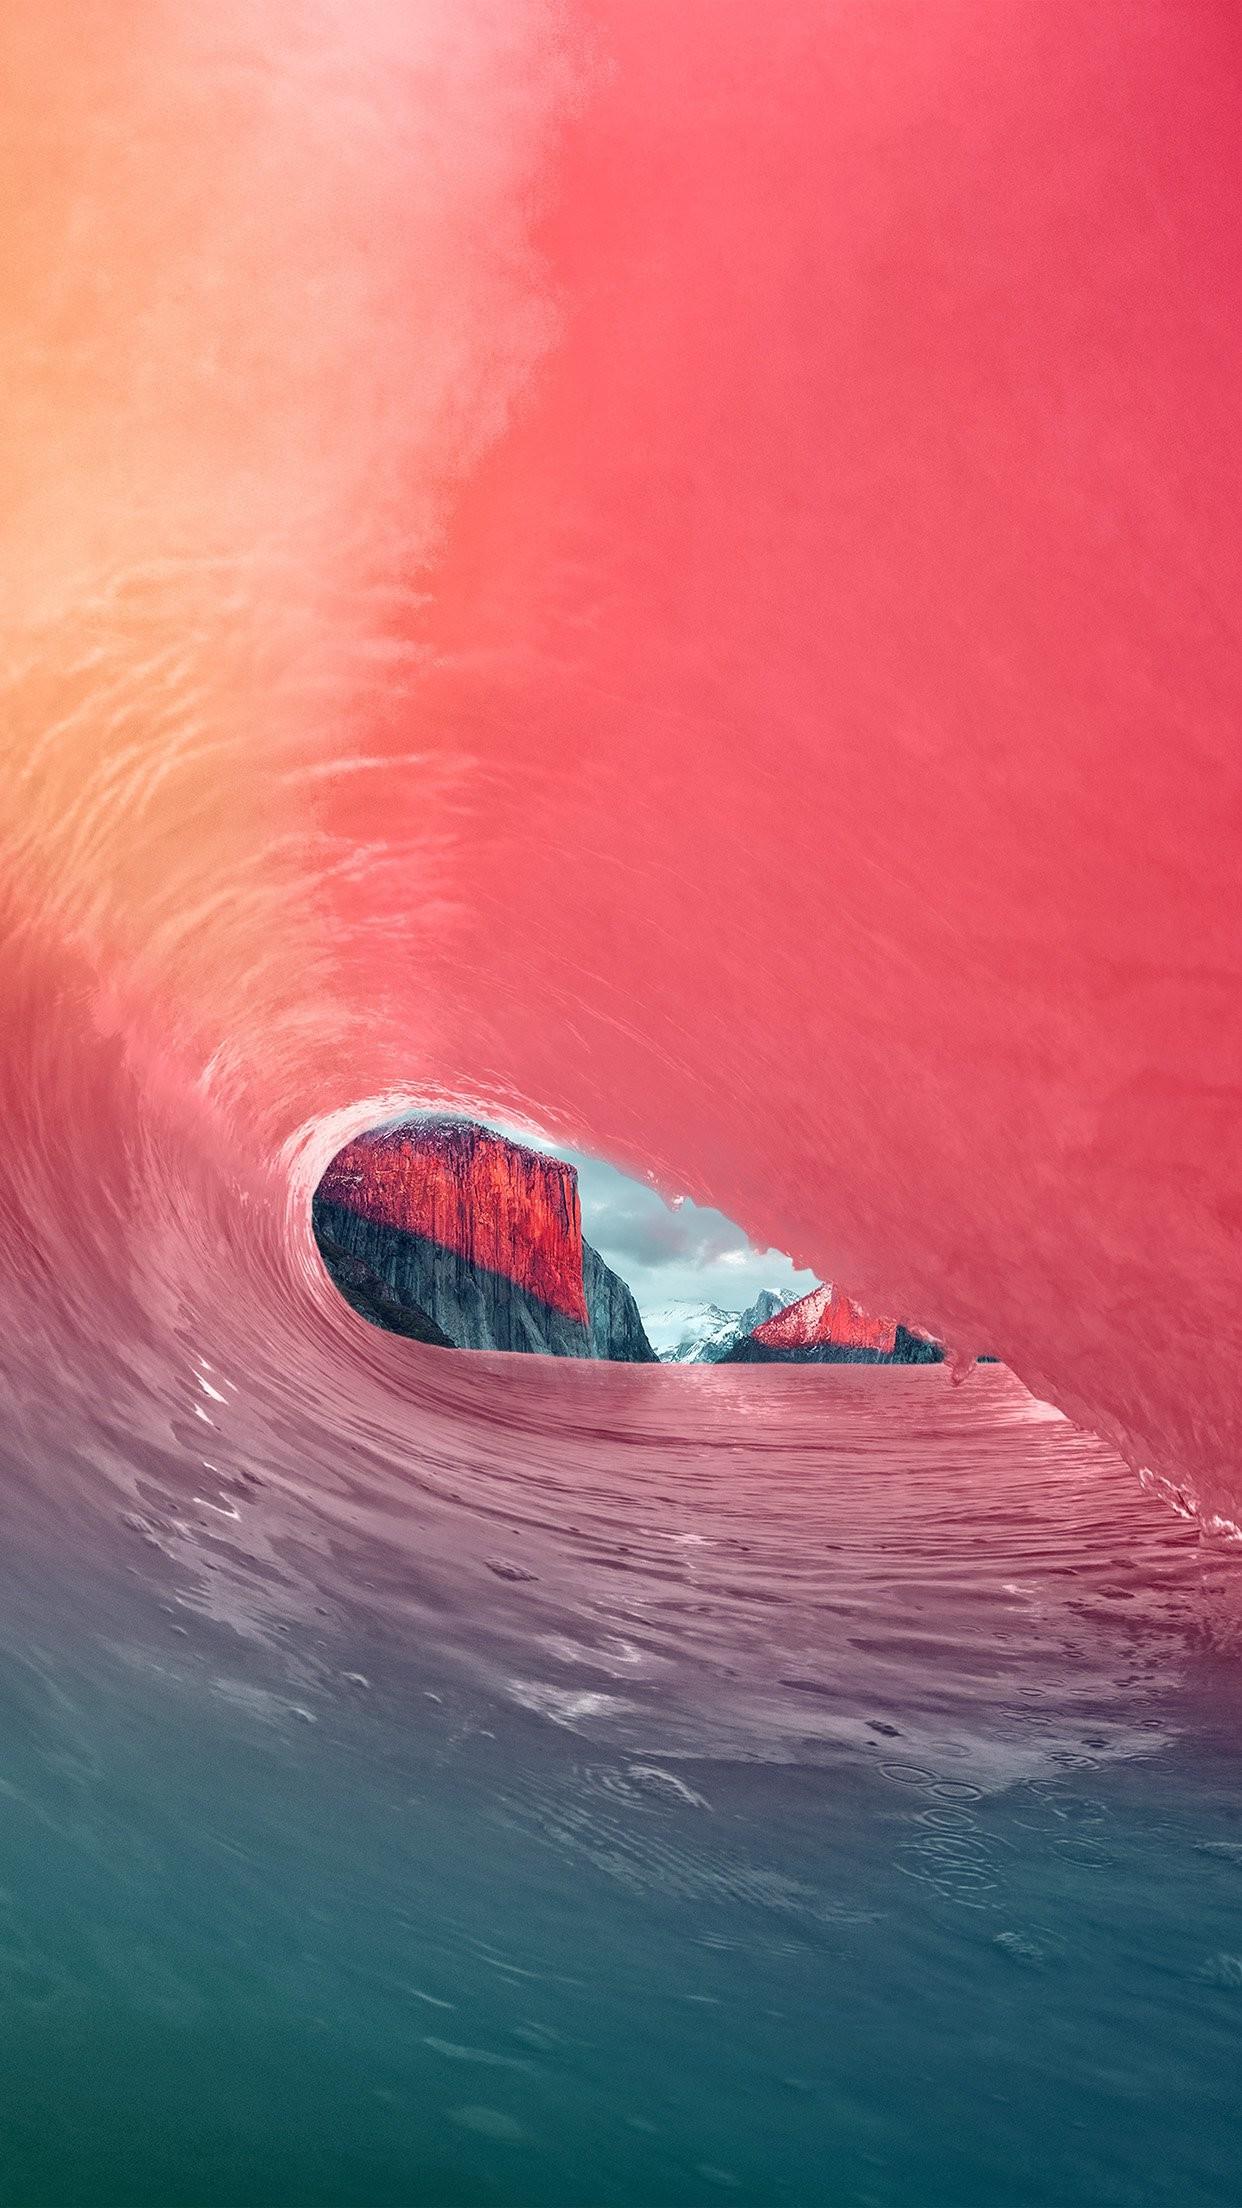 … apple osx yosemite wave red rainbow sea blue iphone 7 wallpaper …